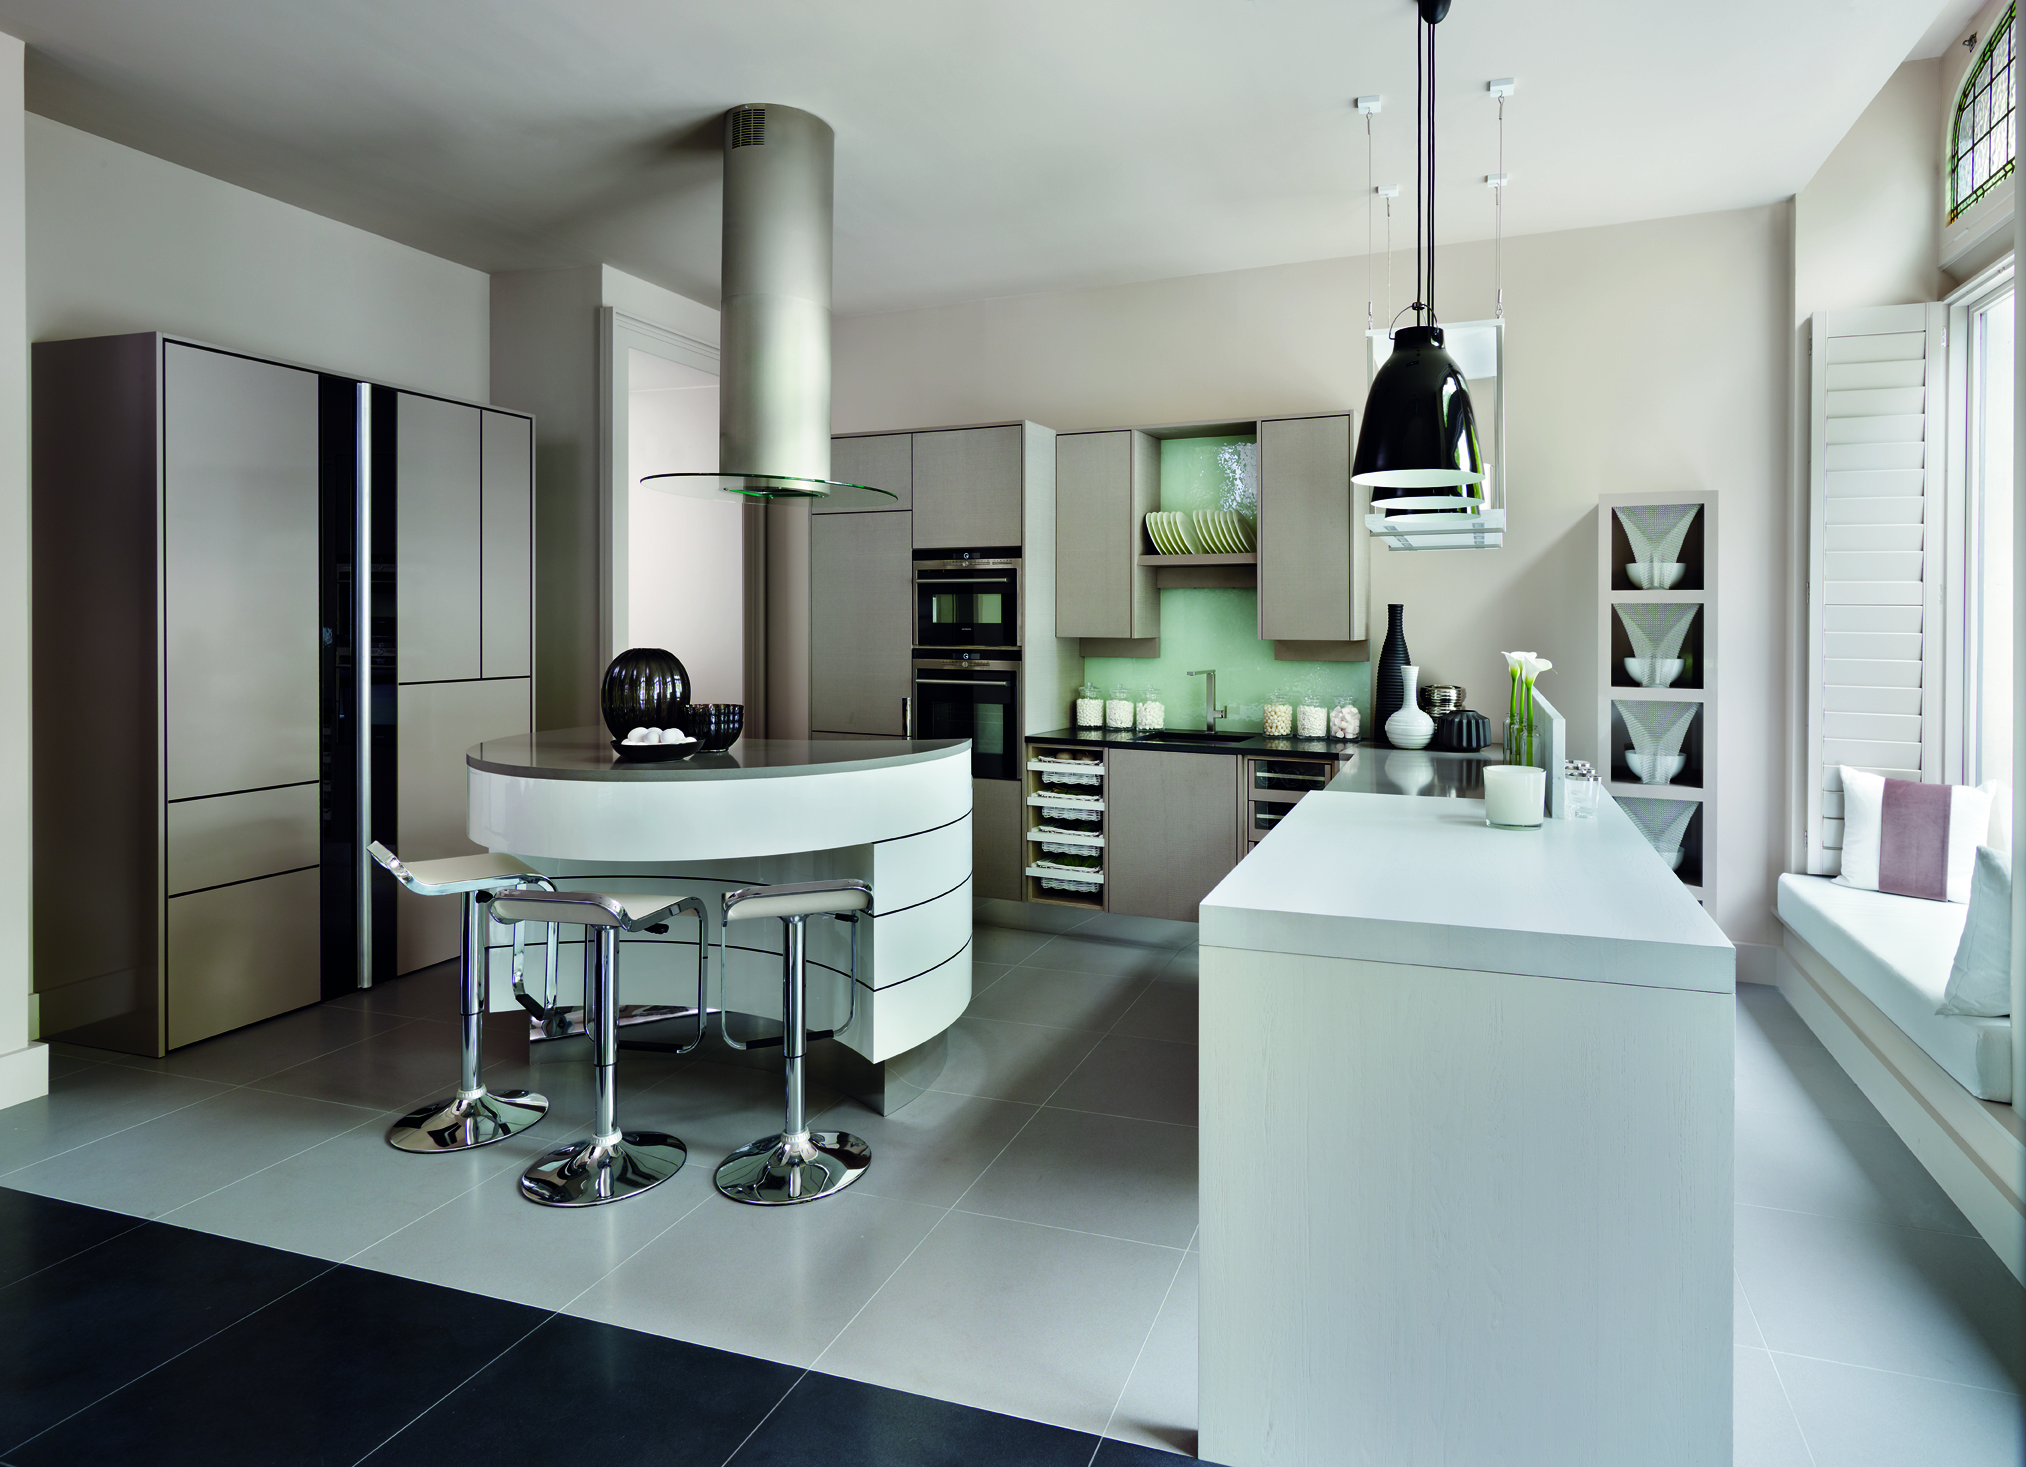 Kelly Hoppen Kitchen Designs Smallbone Kelly Hoppen Collection Heart Home